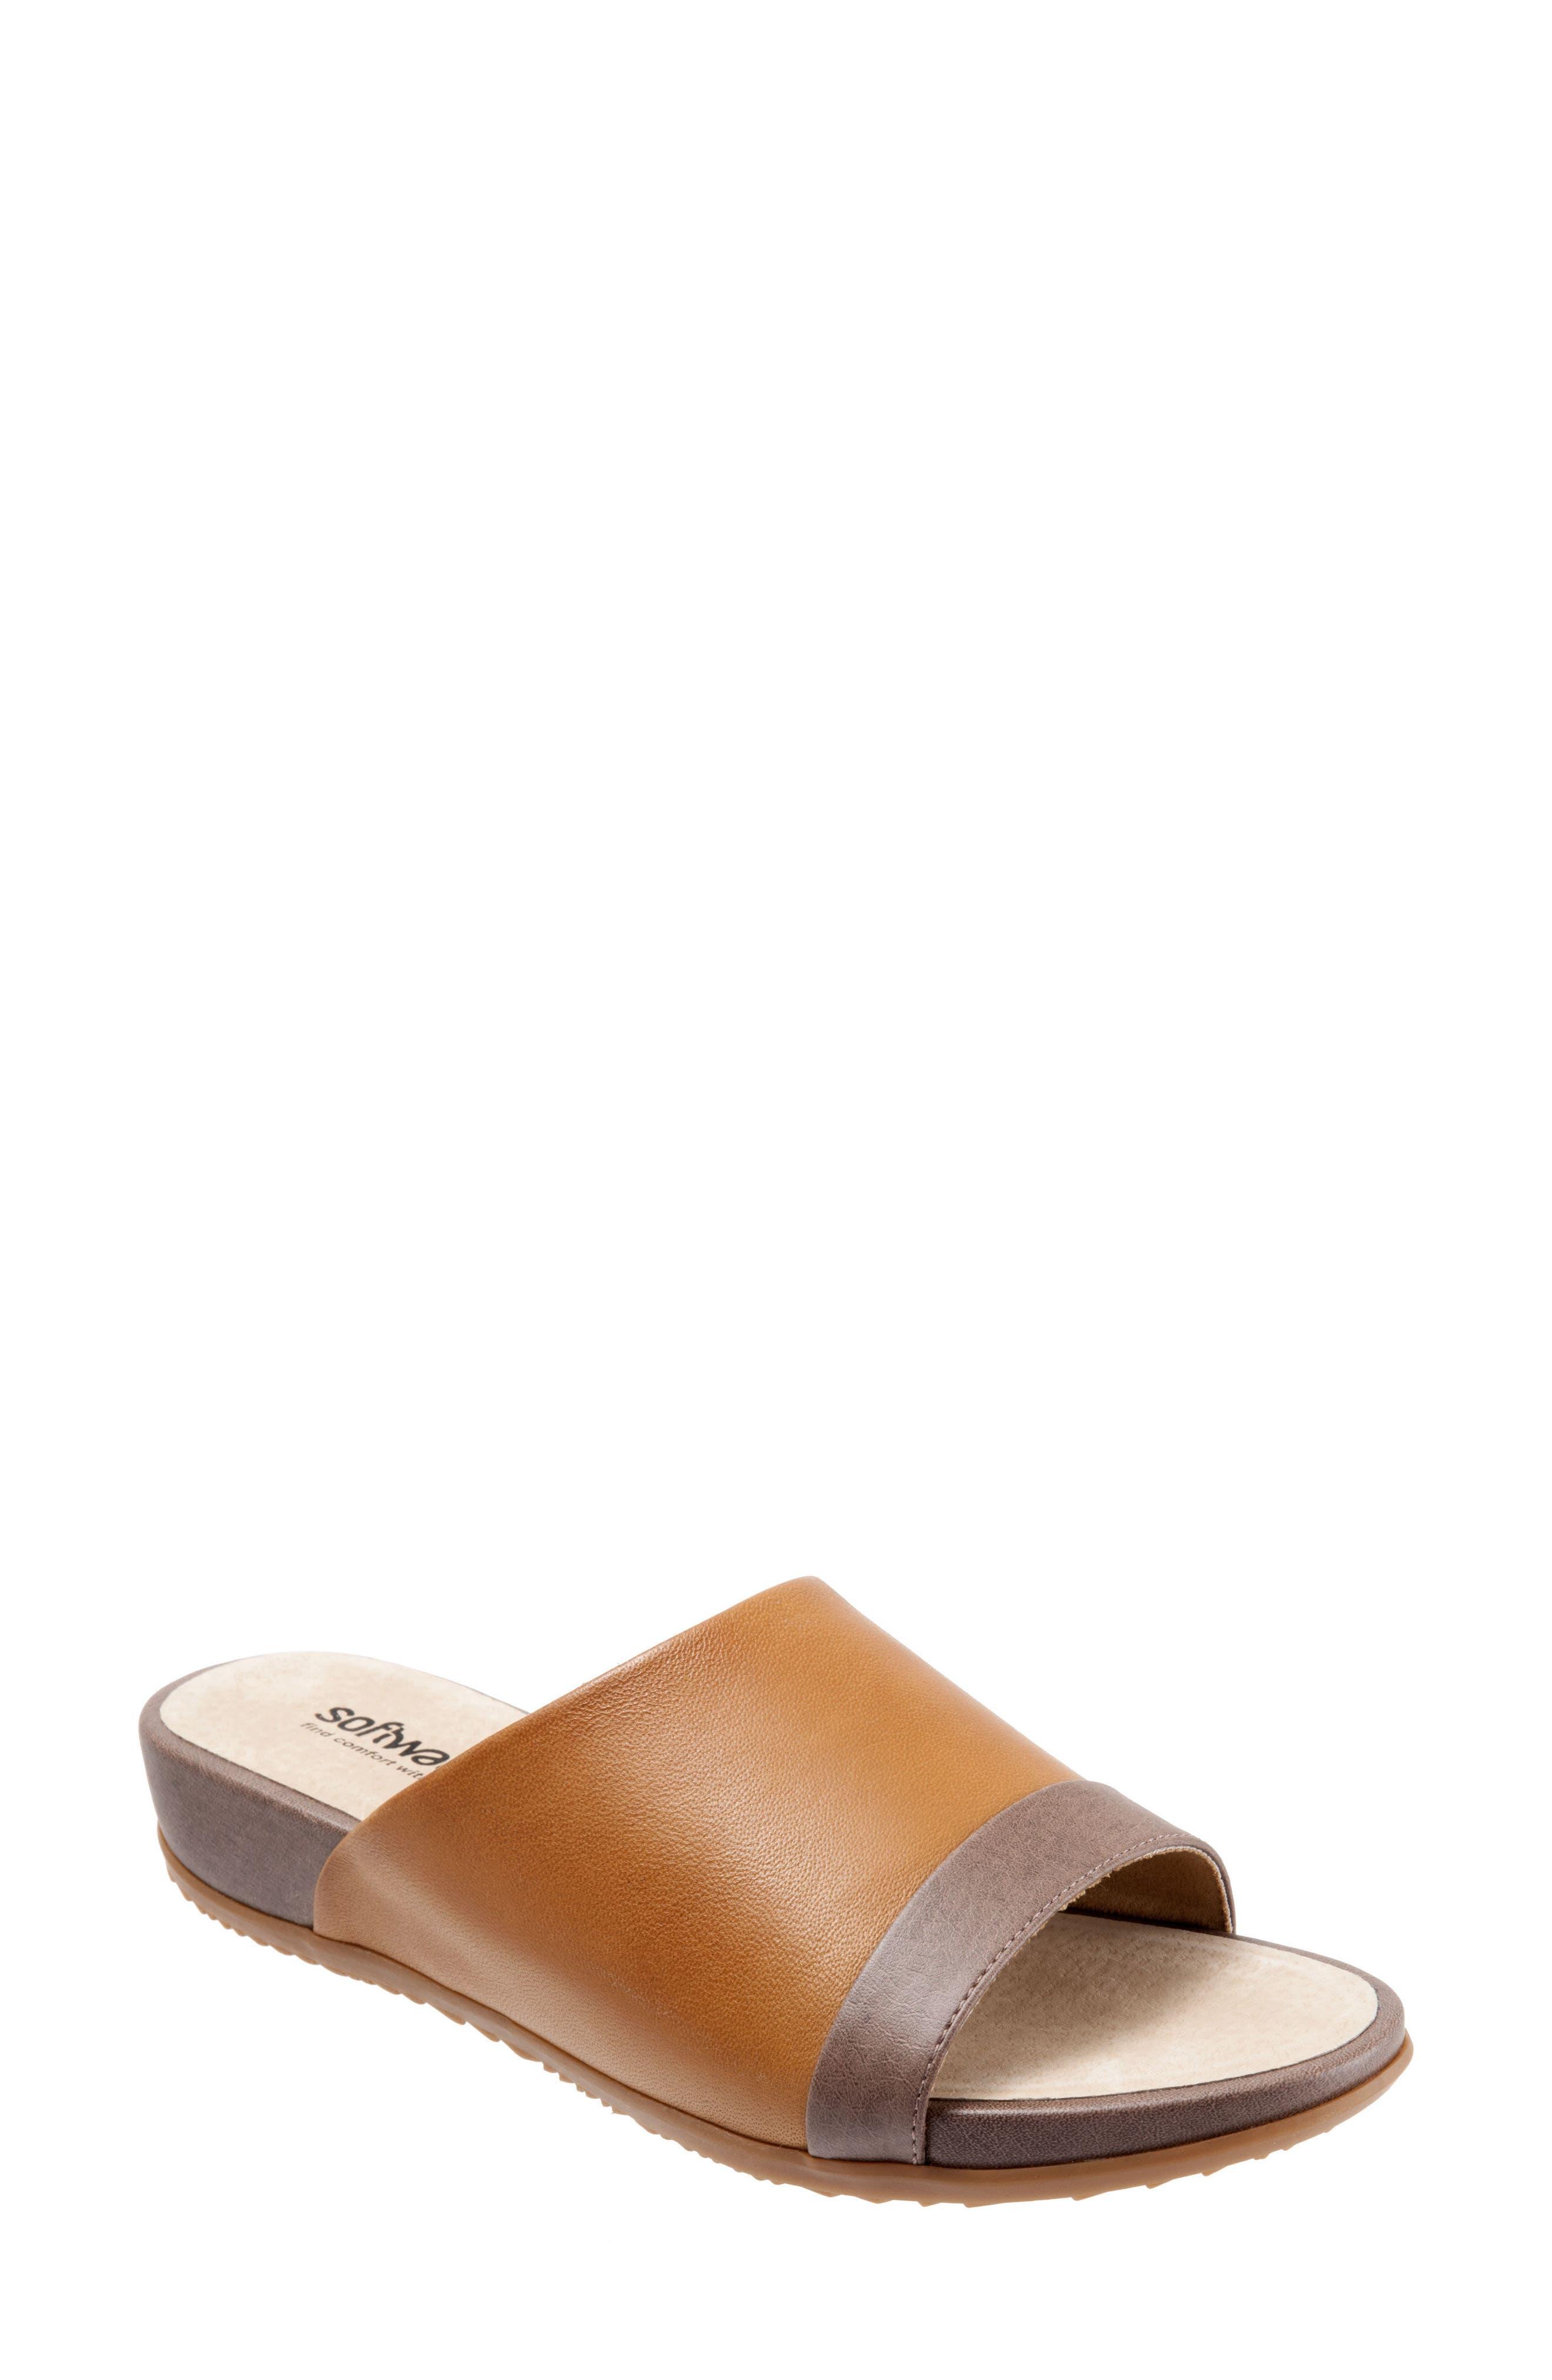 Alternate Image 1 Selected - SoftWalk® Del Mar Slide Sandal (Women)